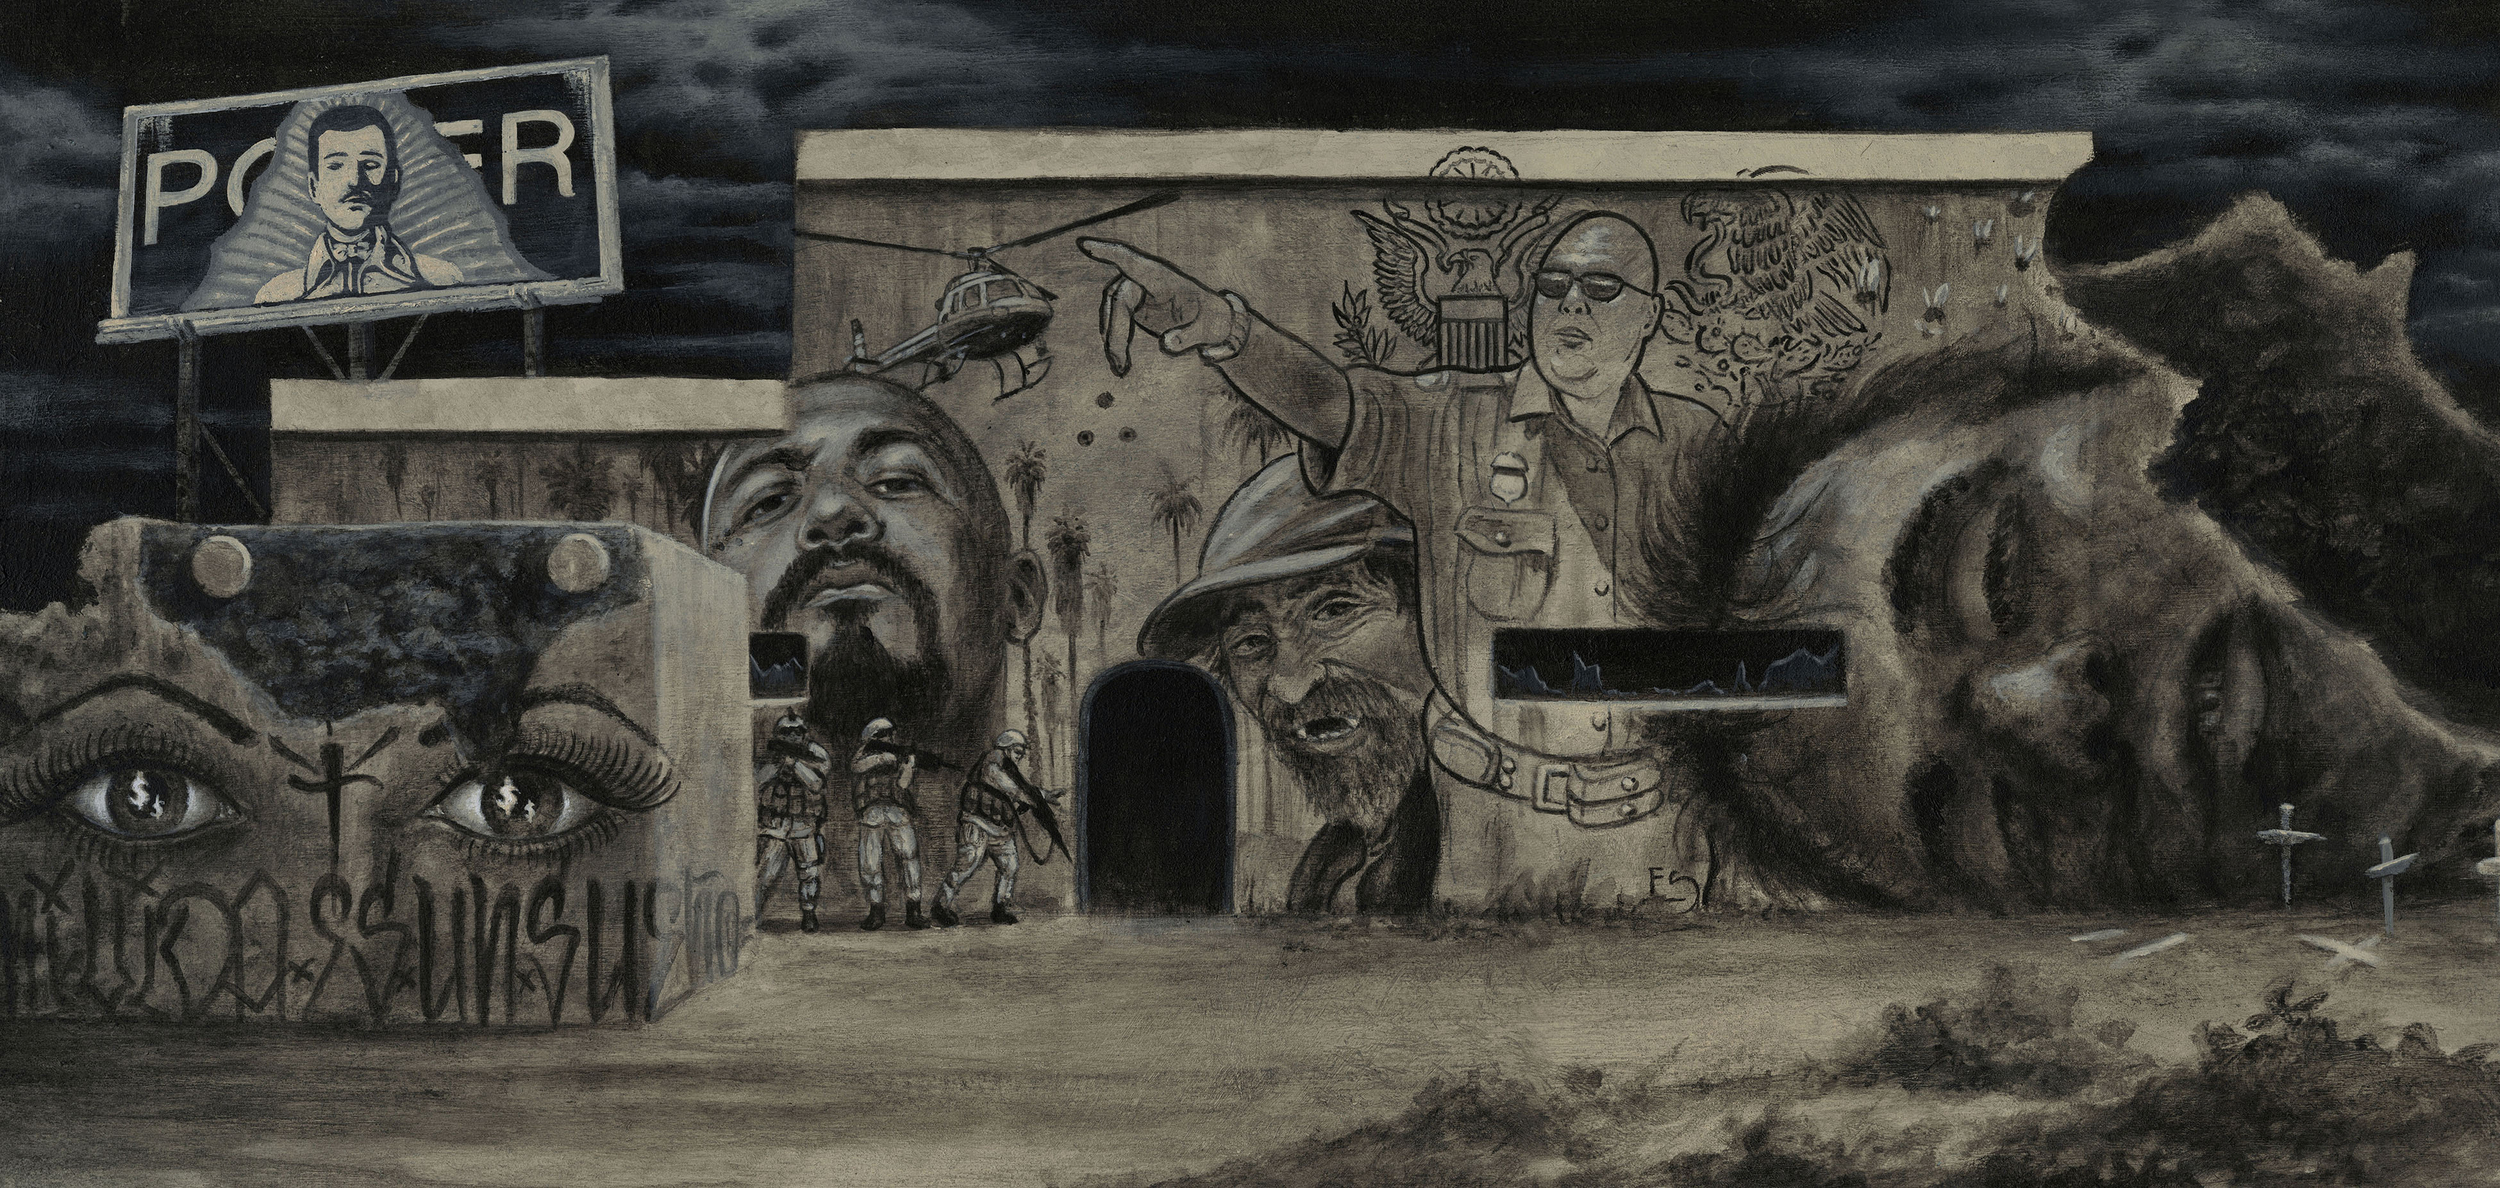 Evan Skrederstu & Steve Martinez.  Southwestern Politics . 2014 - acrylic on board, 1' x 2'.